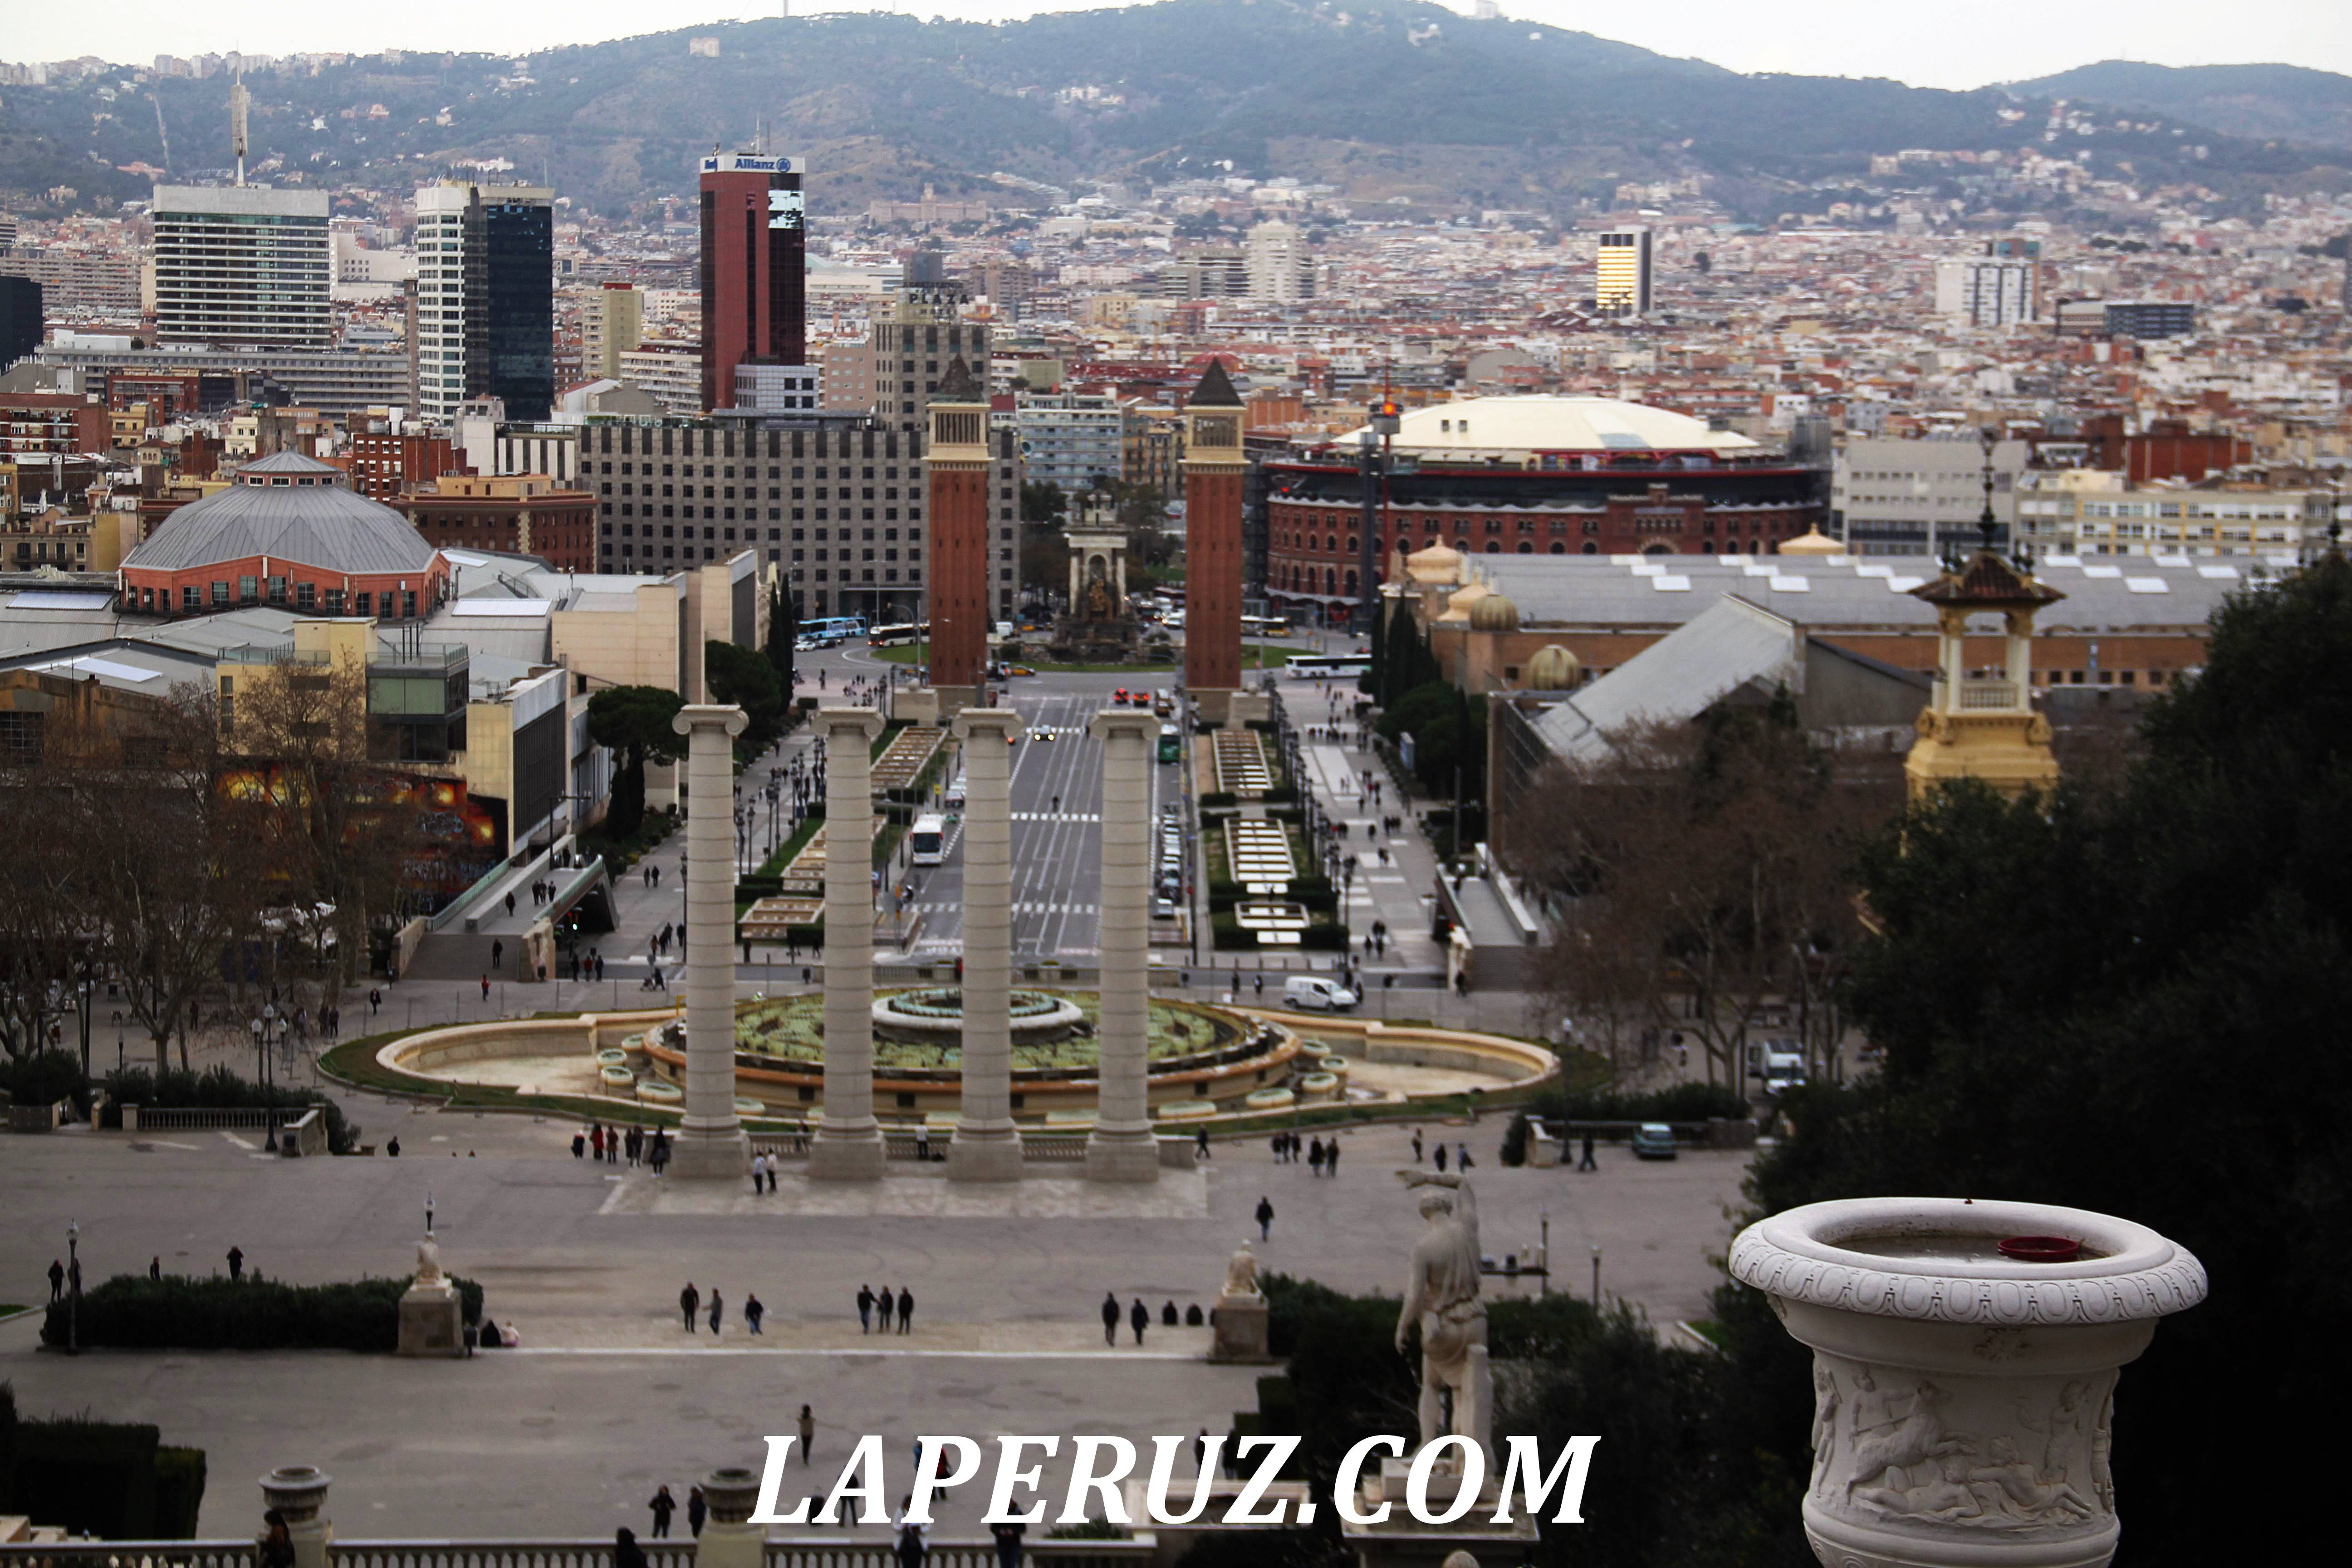 ploschad_ispanii_izdaleka